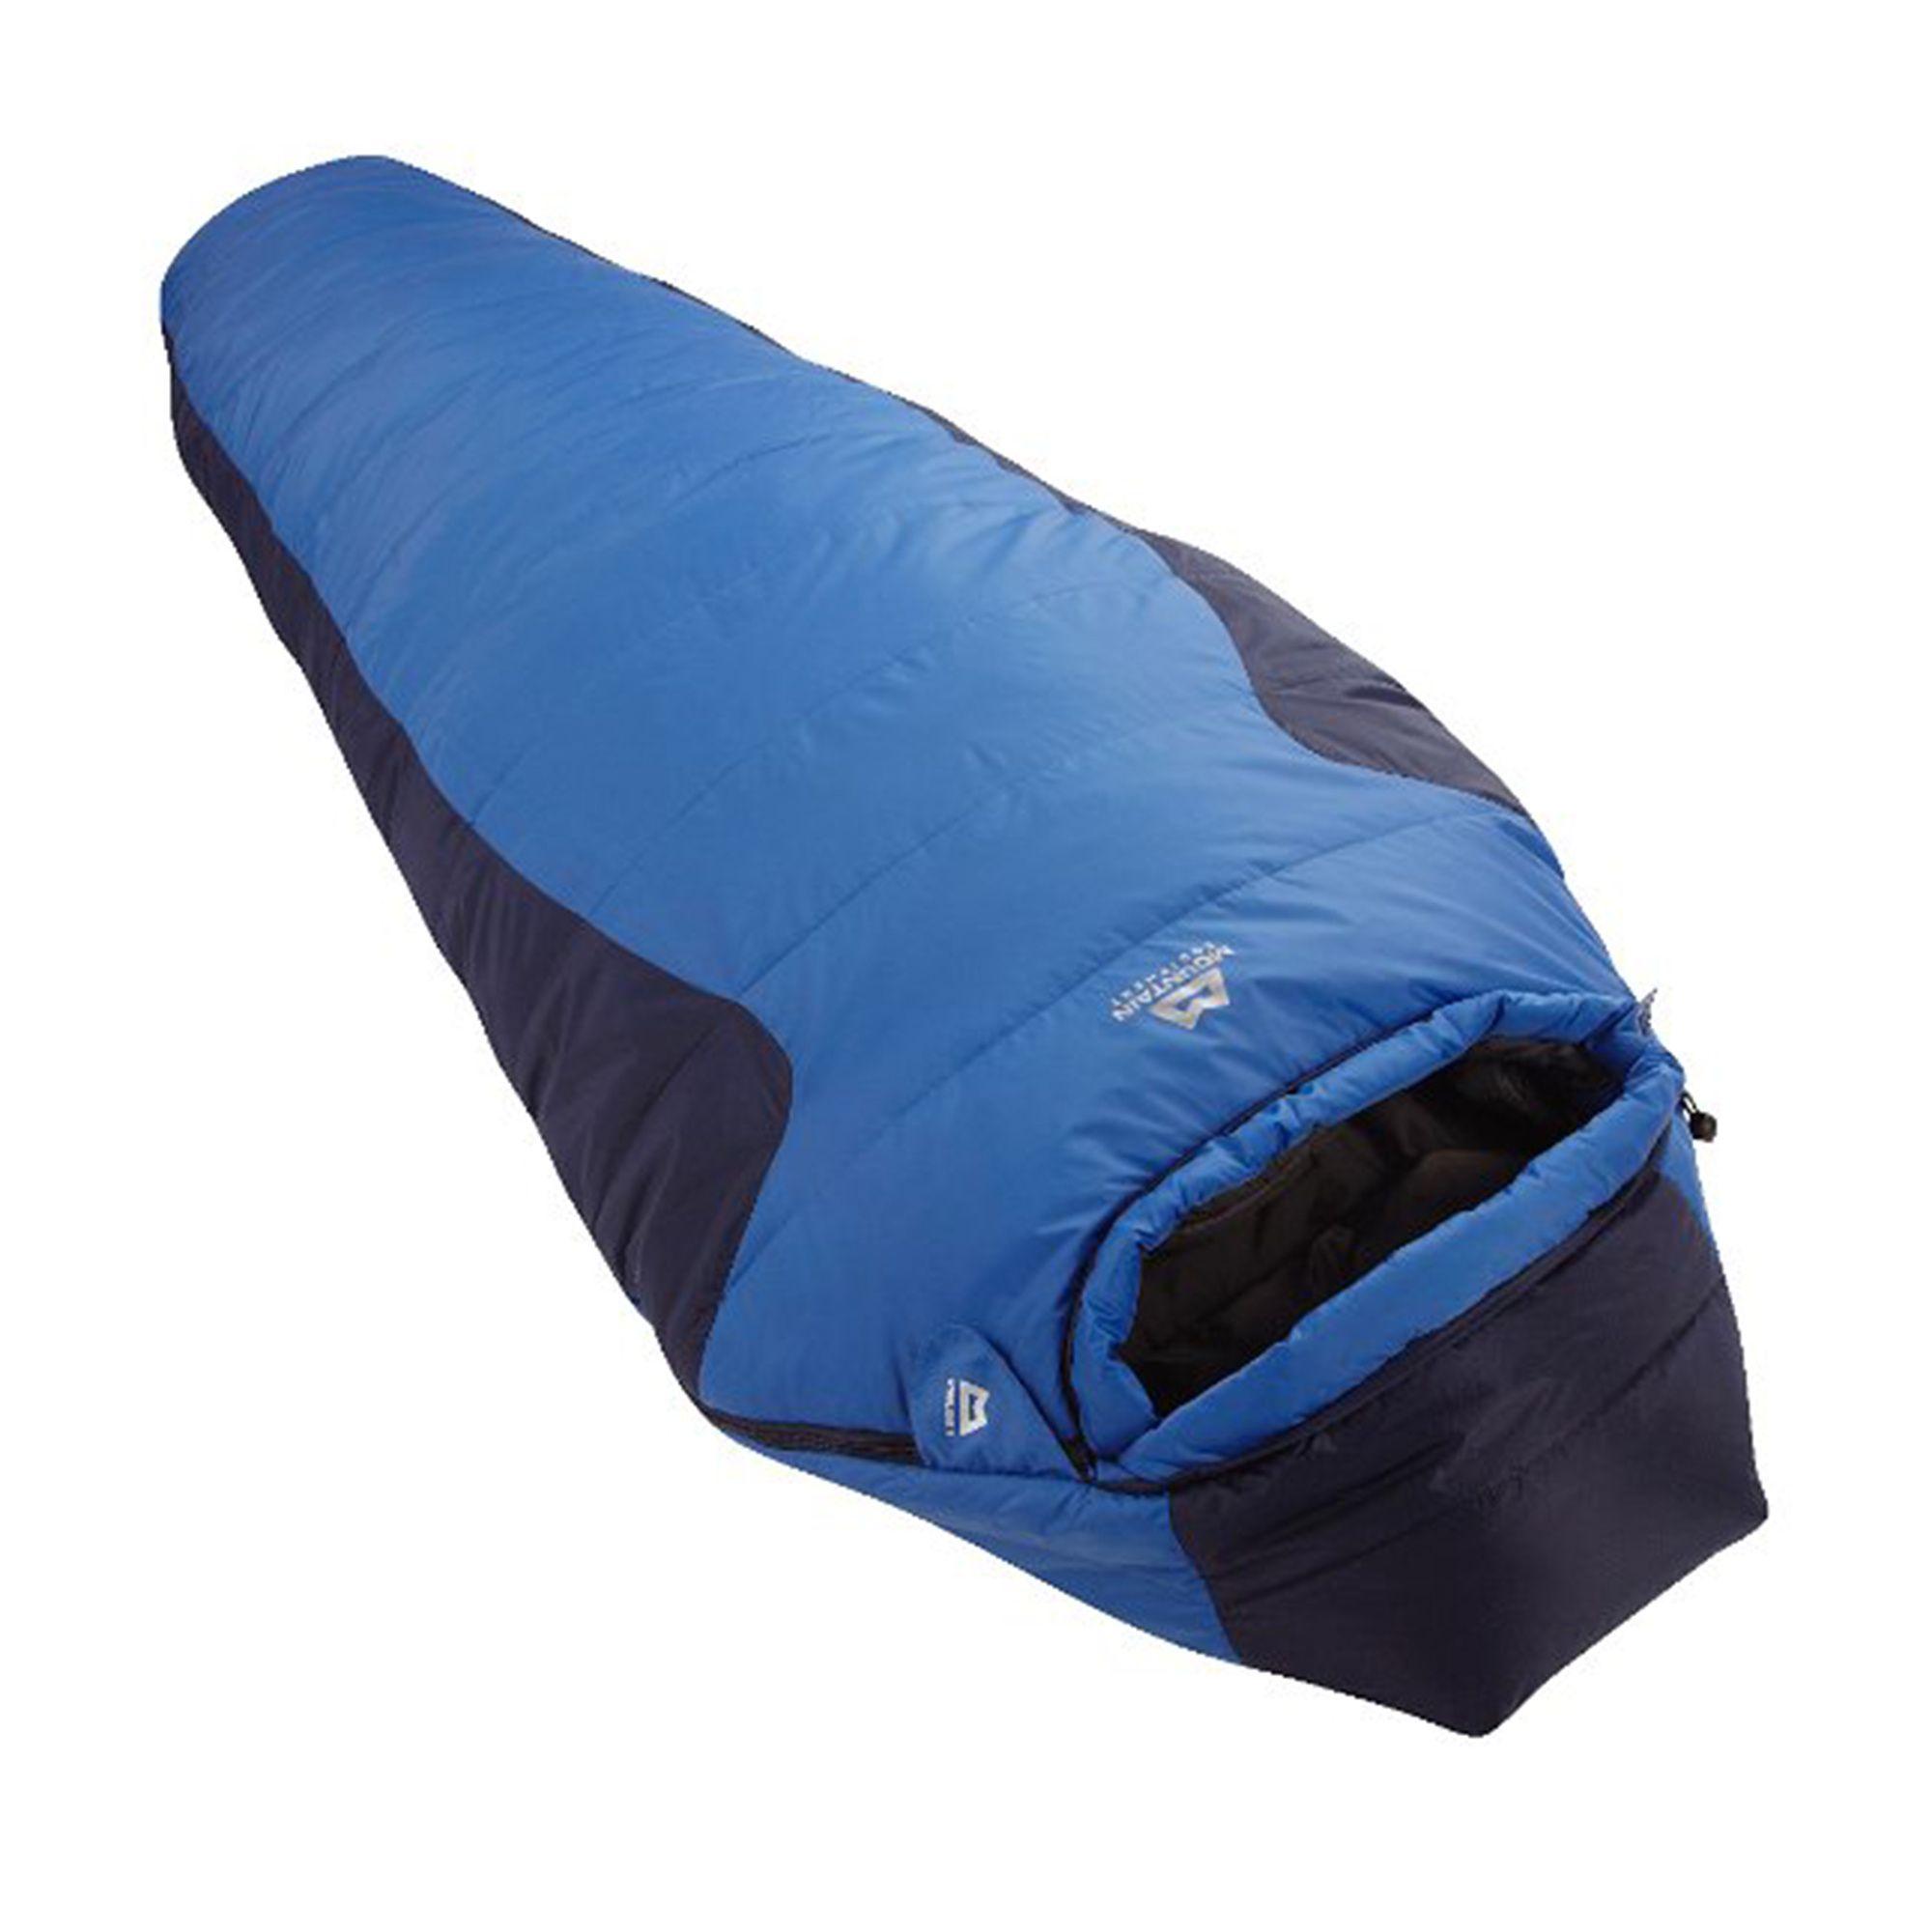 MOUNTAIN EQUIPMENT Starlight II Sleeping Bag